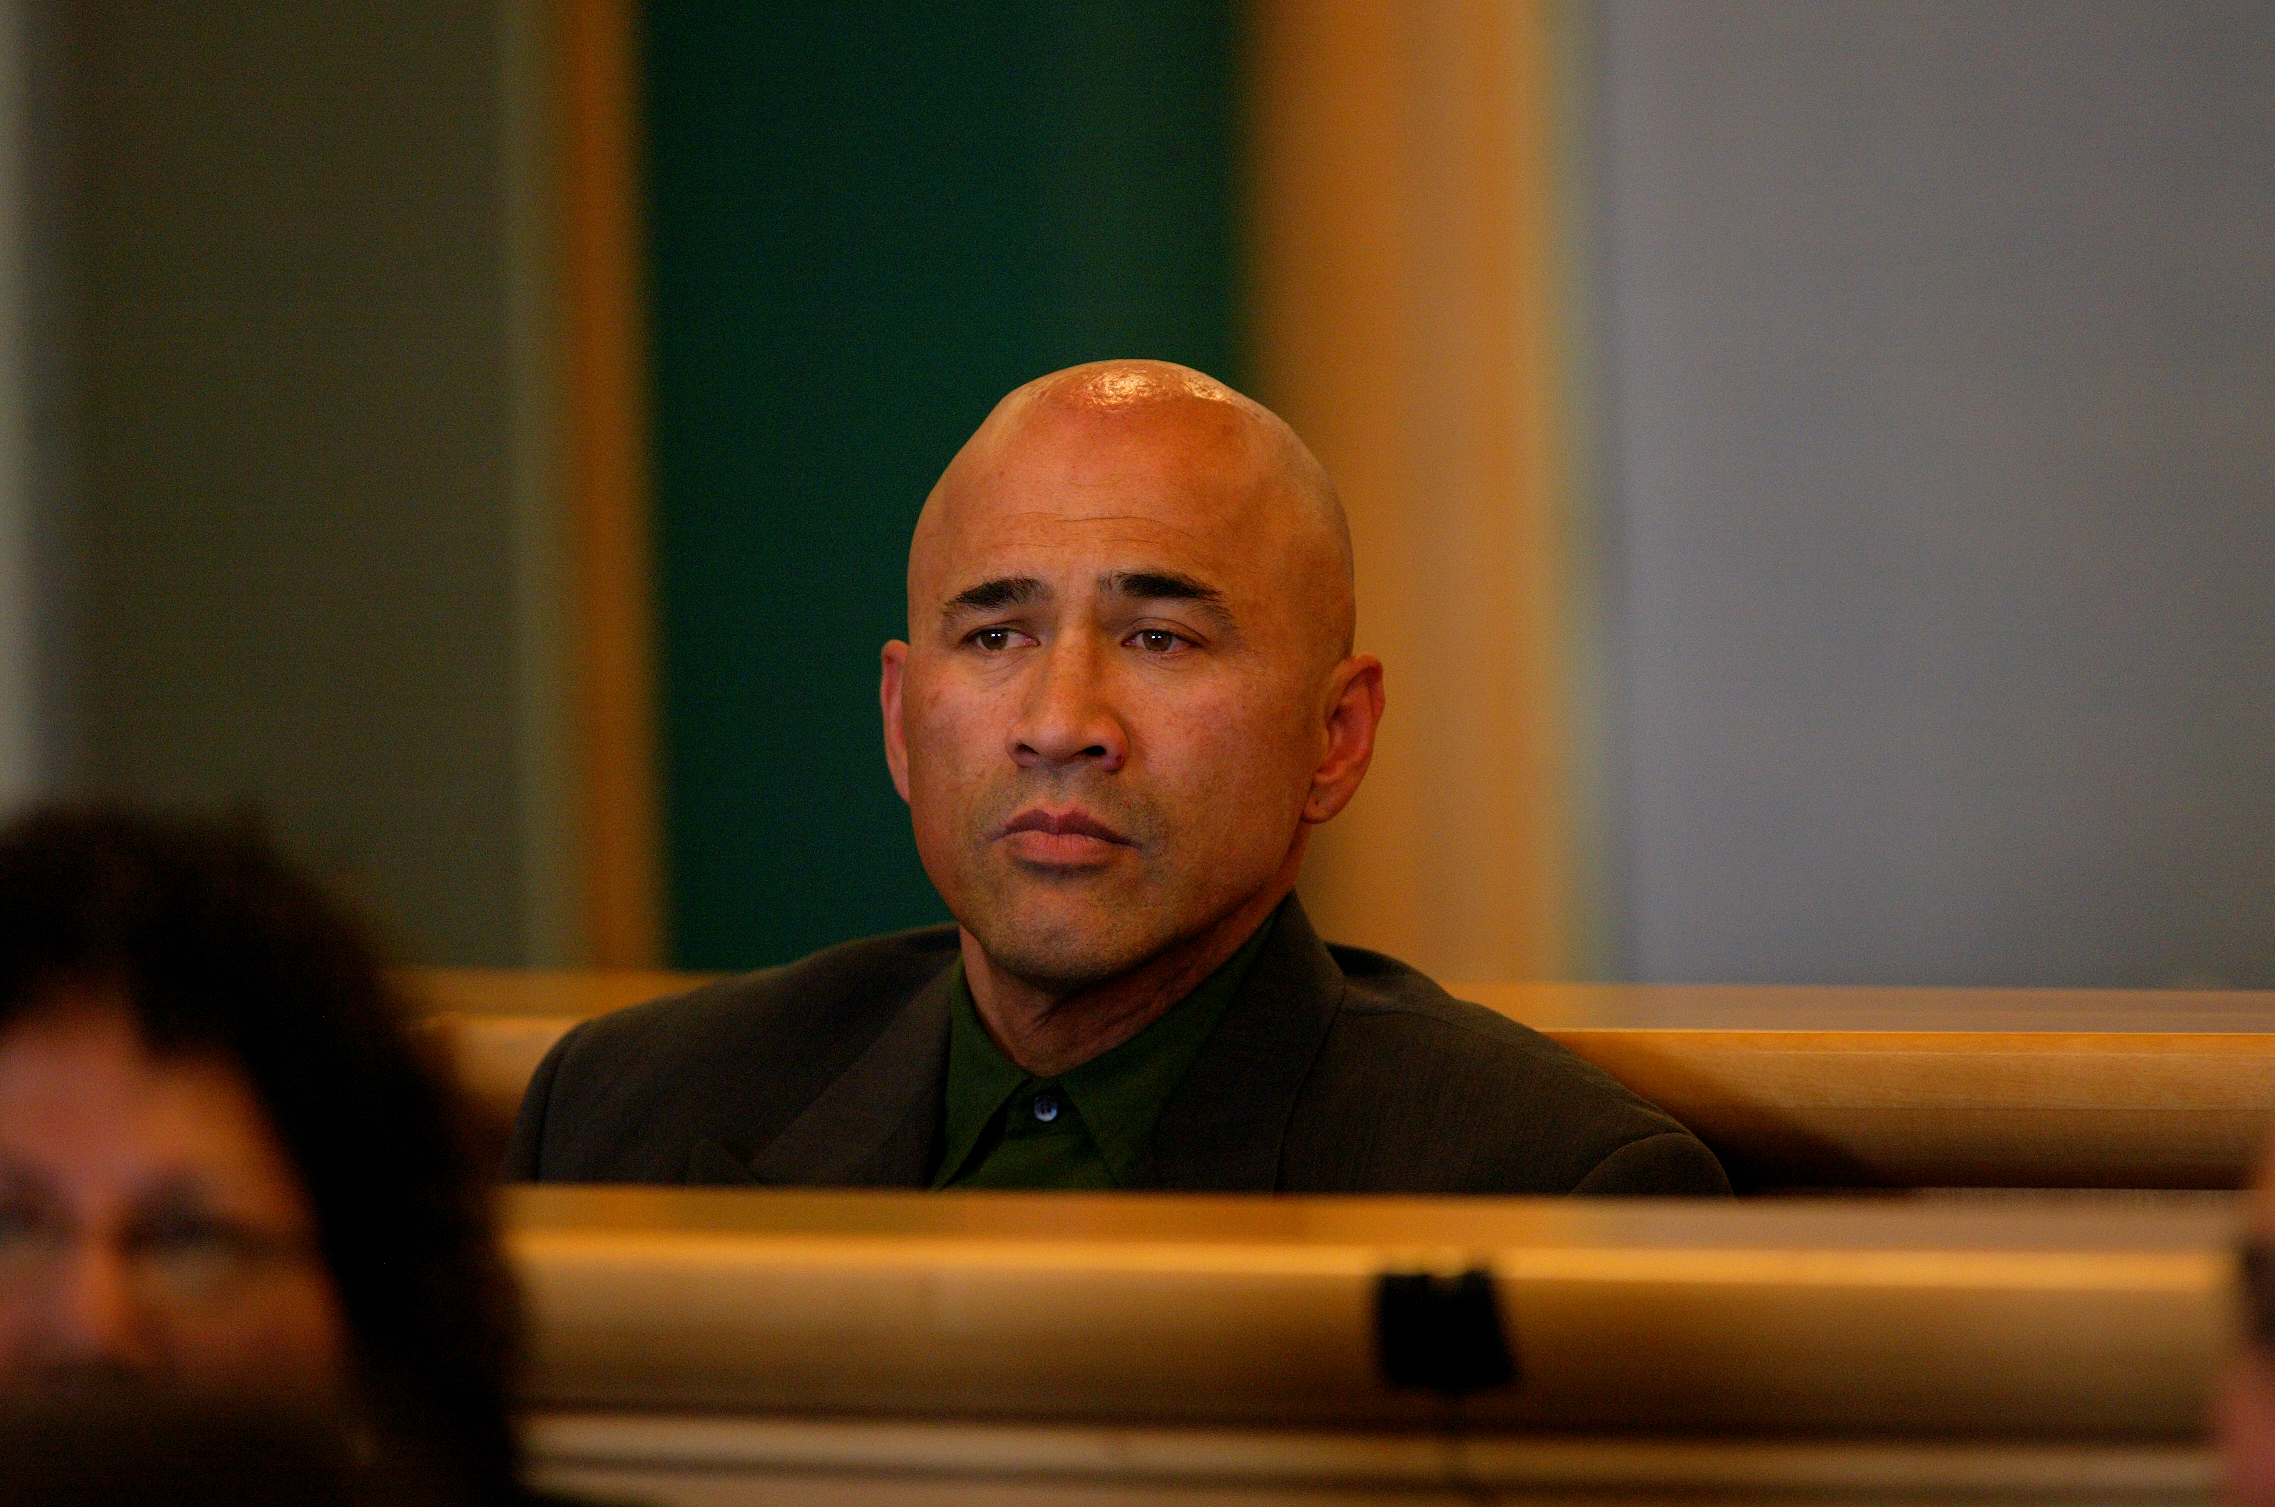 Killer back in jail after footage confirms crime - NZ Herald